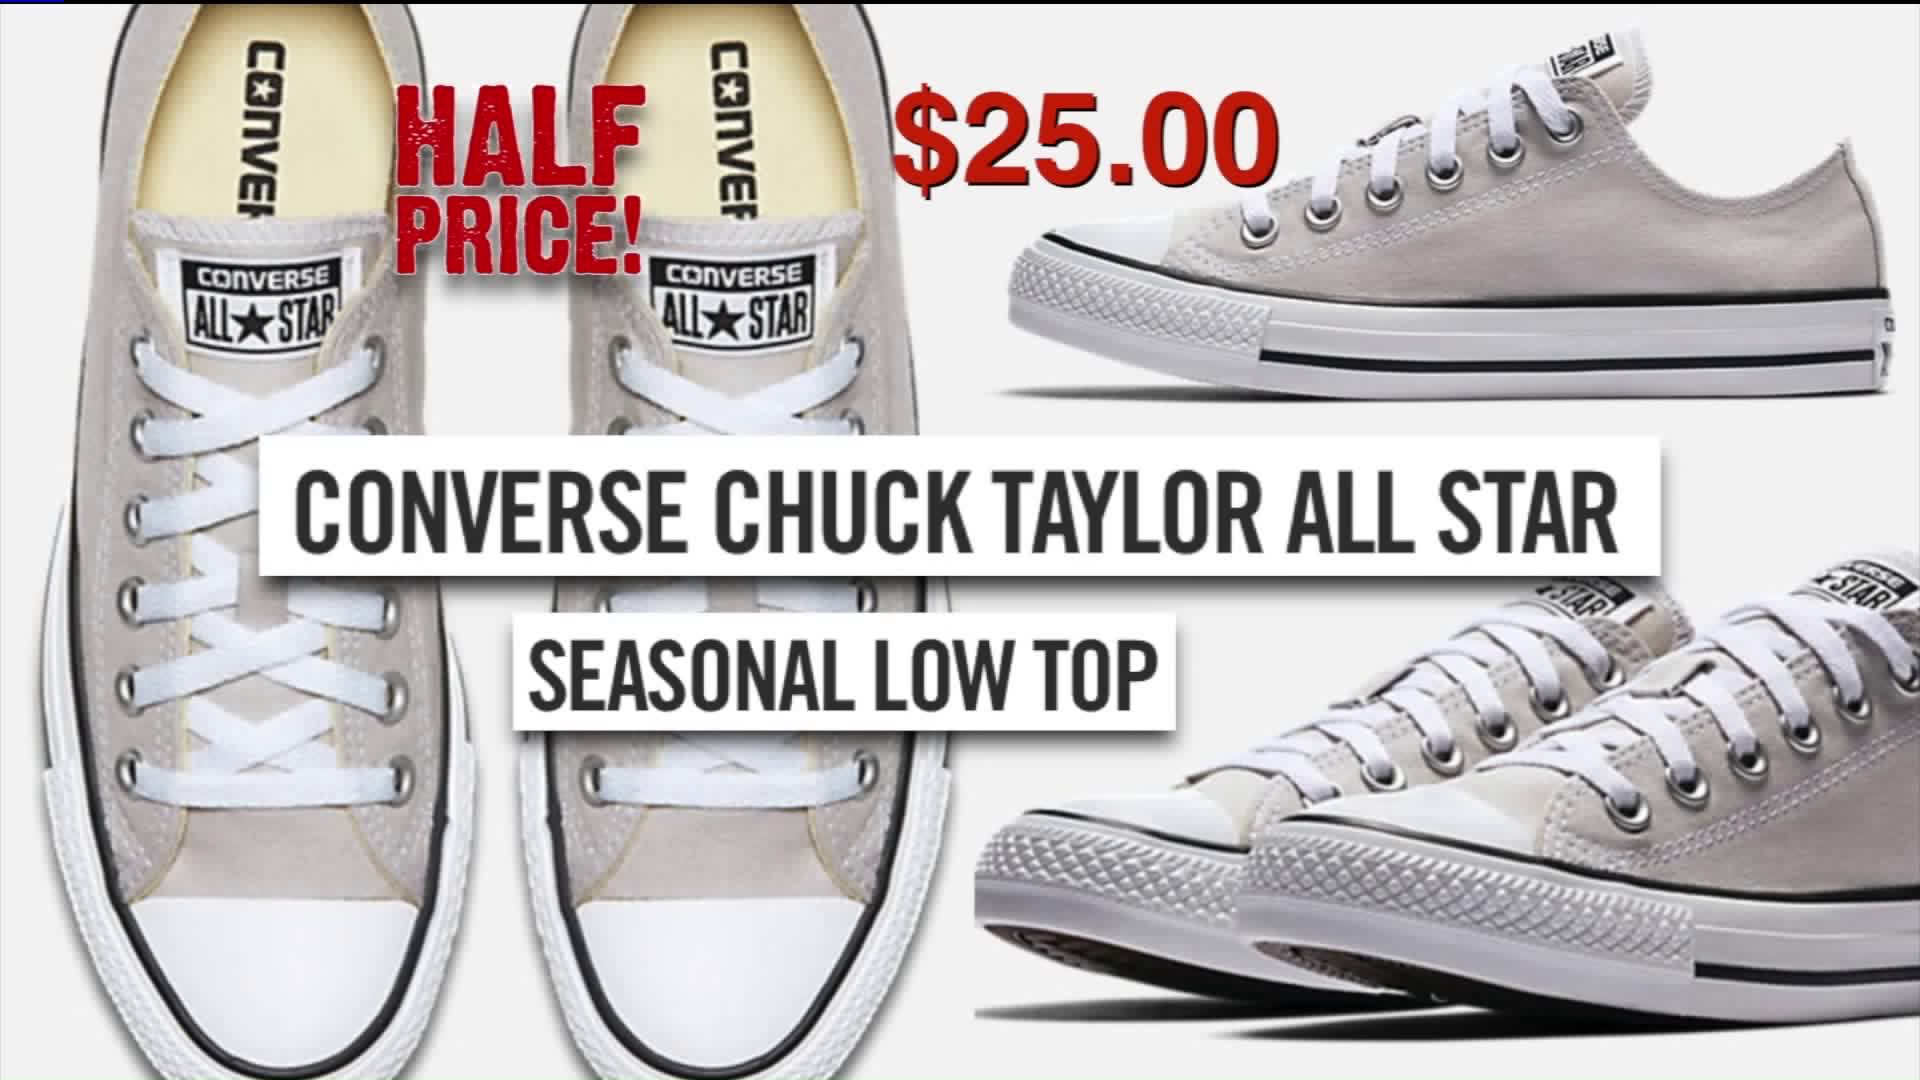 Half price Converse Chuck Taylor All